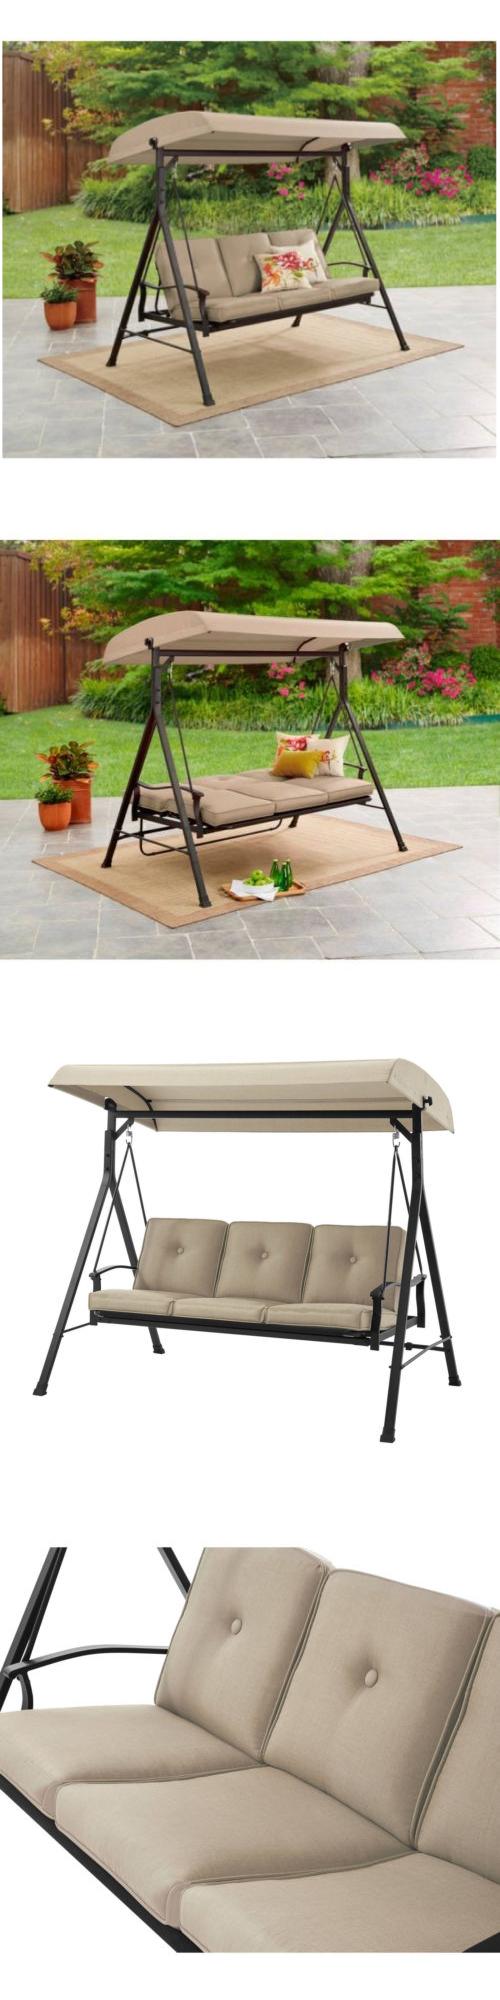 Swings porch swing canopy outdoor furniture seats hammock